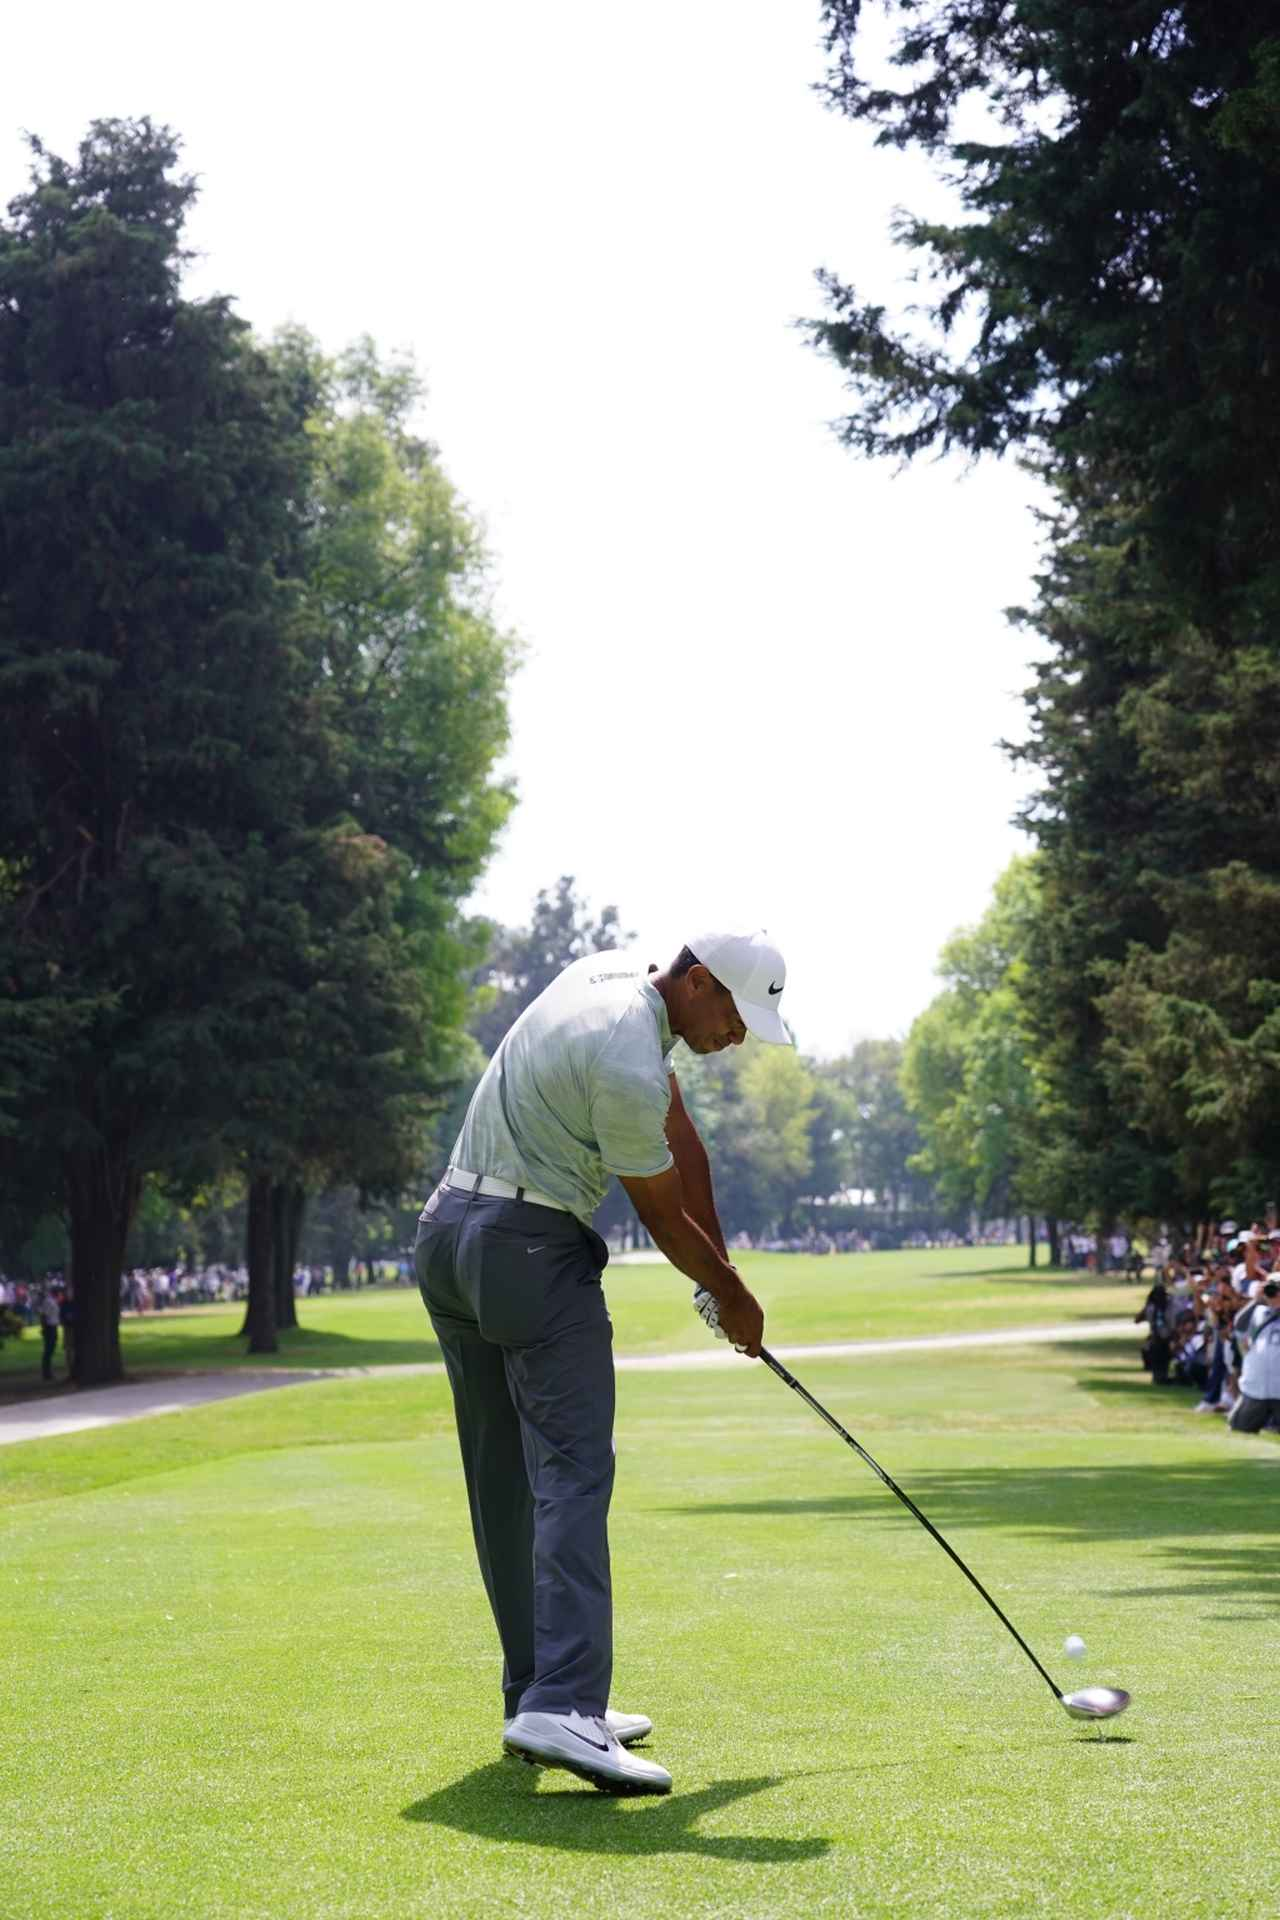 Images : 9番目の画像 - タイガー・ウッズのドライバー連続写真 - みんなのゴルフダイジェスト